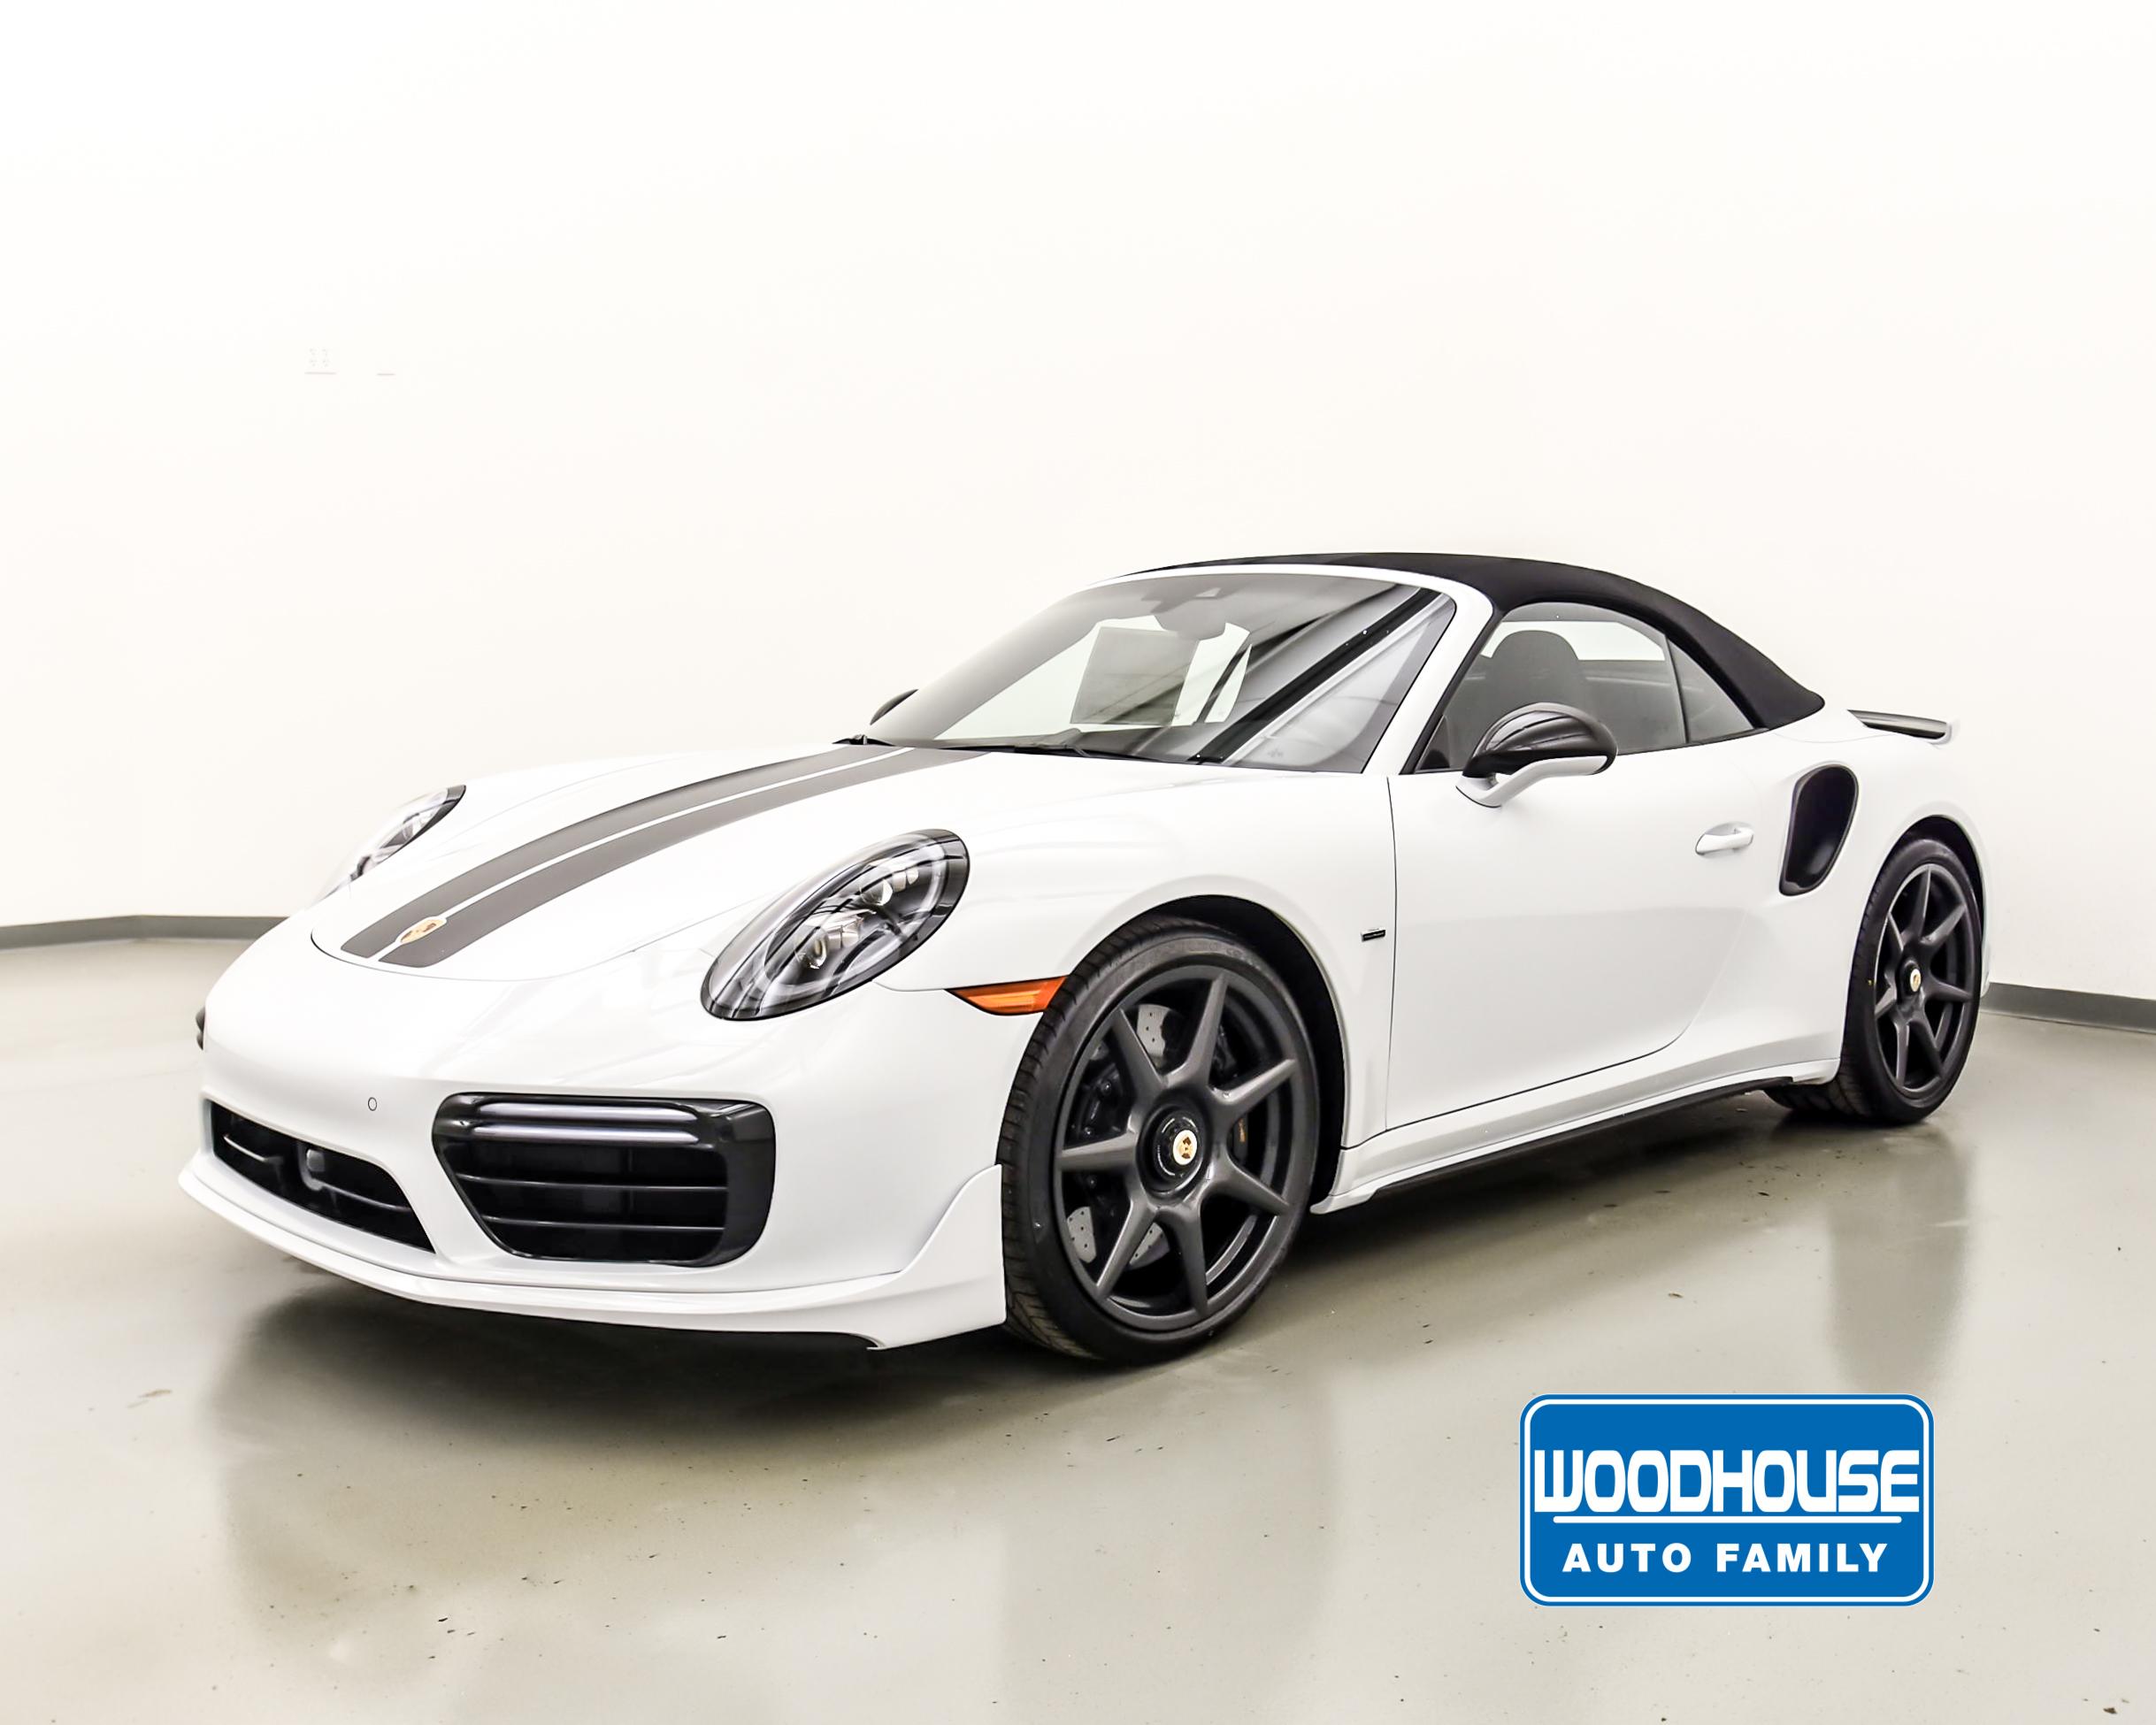 Woodhouse   New 2019 Porsche 911 Turbo For Sale   Porsche